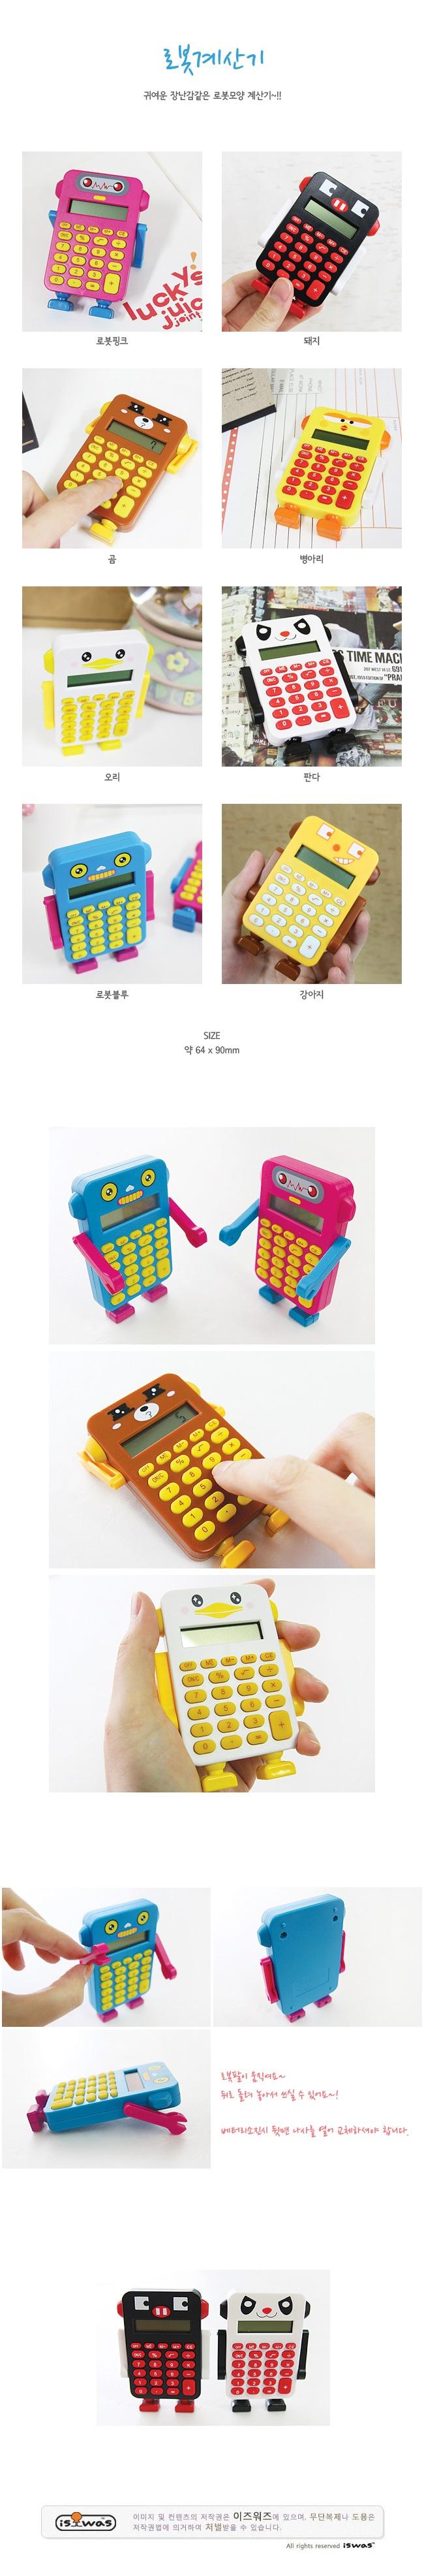 iswas Robot Series Calculator YesStyle Price US$15.00